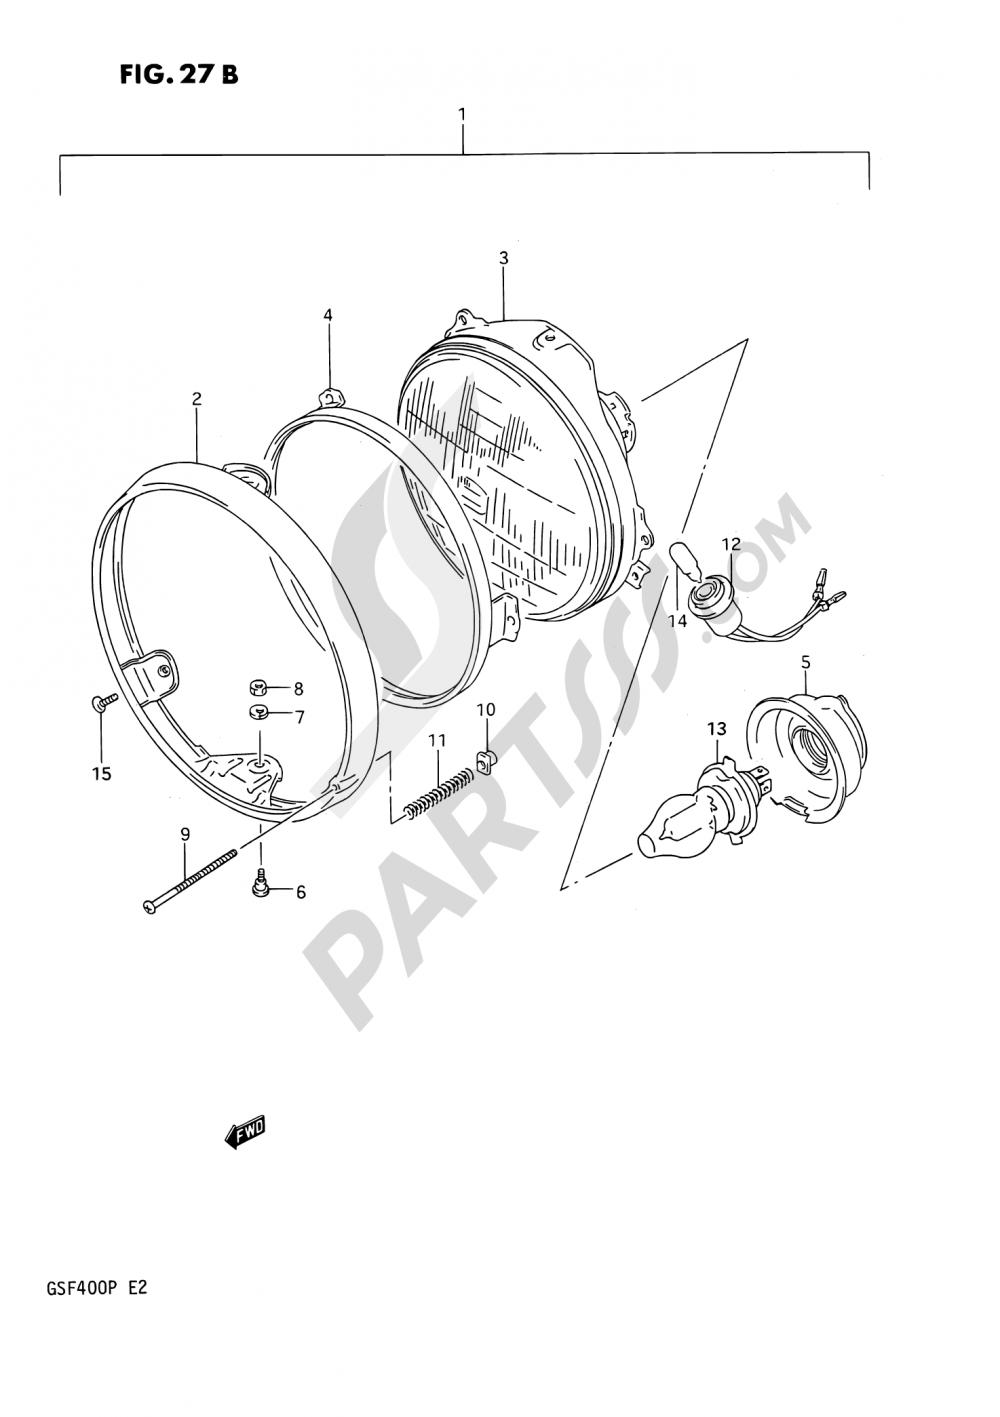 27B - HEADLAMP (MODEL P E04,E16,E21,E22,E25,E34,E53) Suzuki BANDIT GSF400 1992